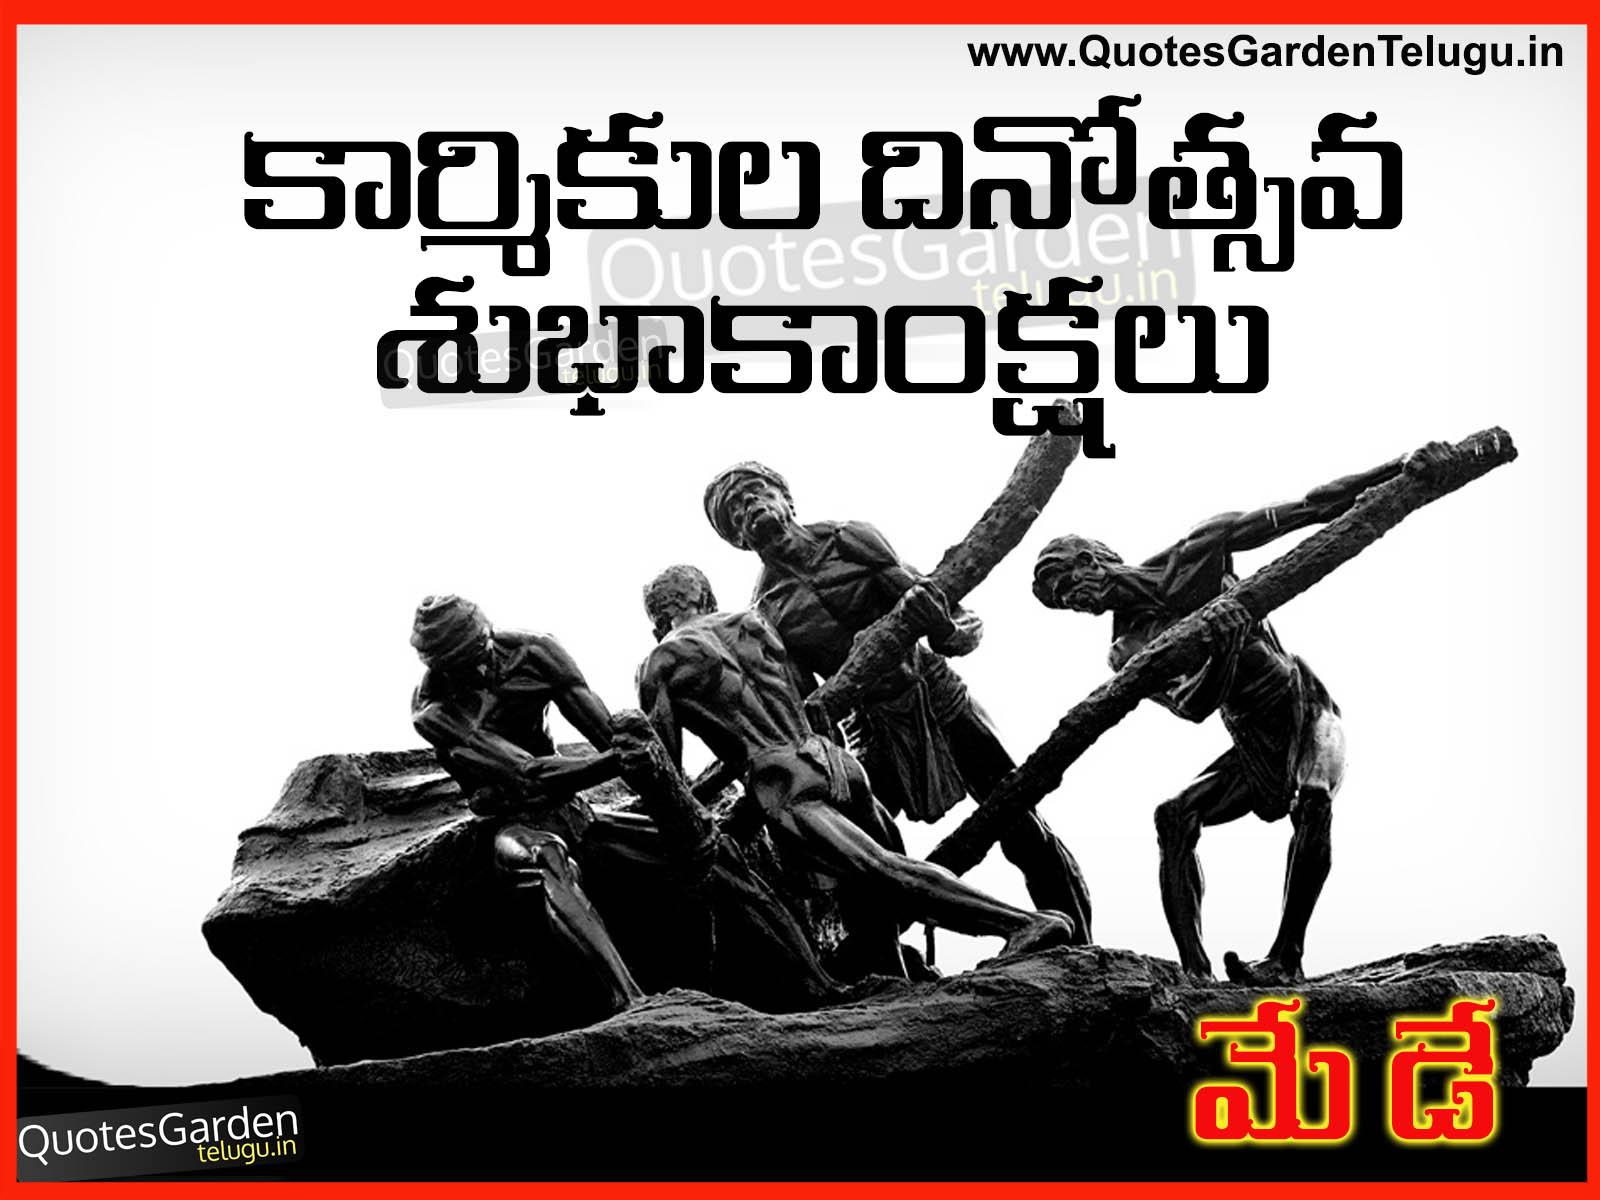 May Day Telugu Greetings Quotes Wallpapers Images Kavitalu